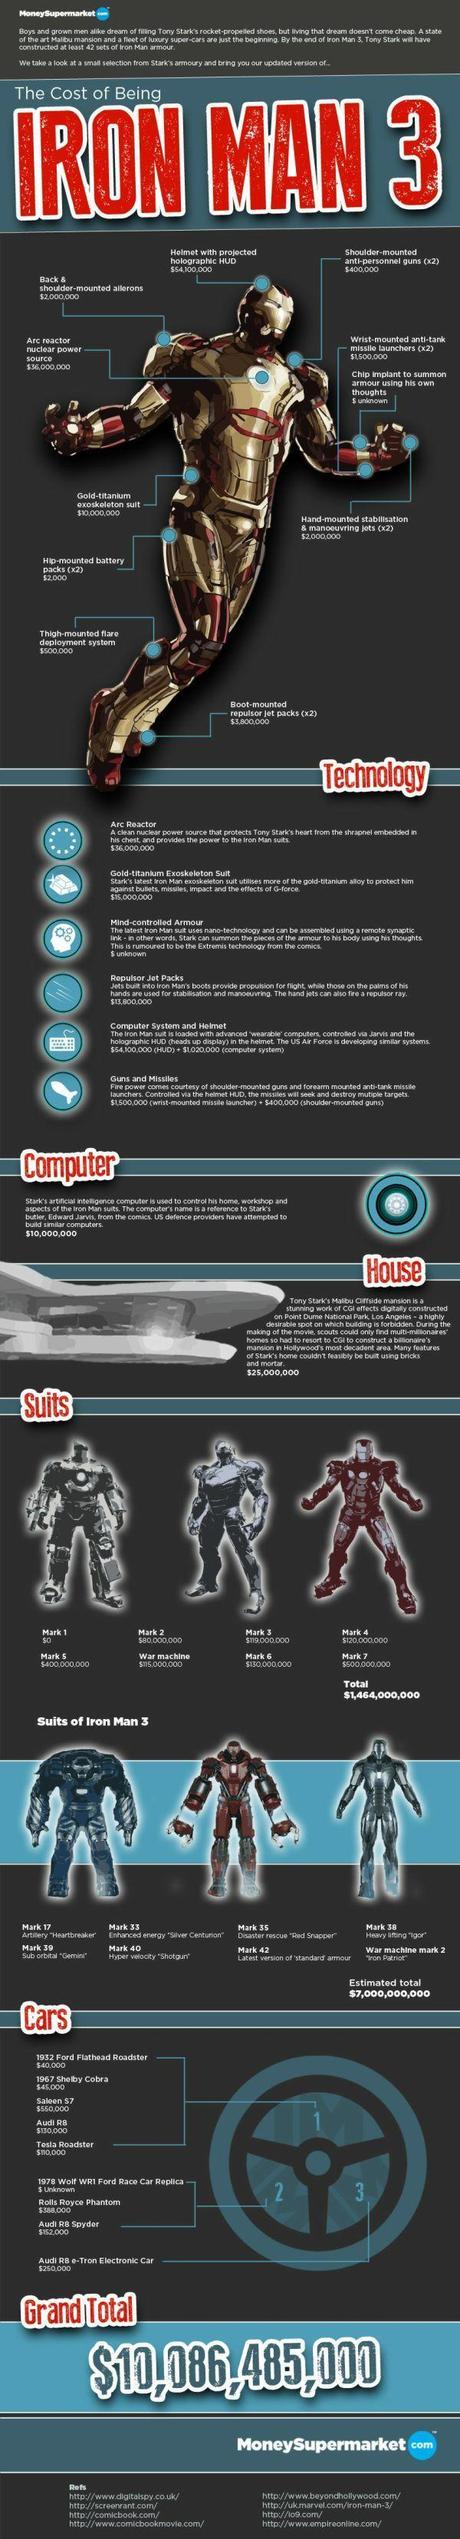 Iron-Man-3-infographic